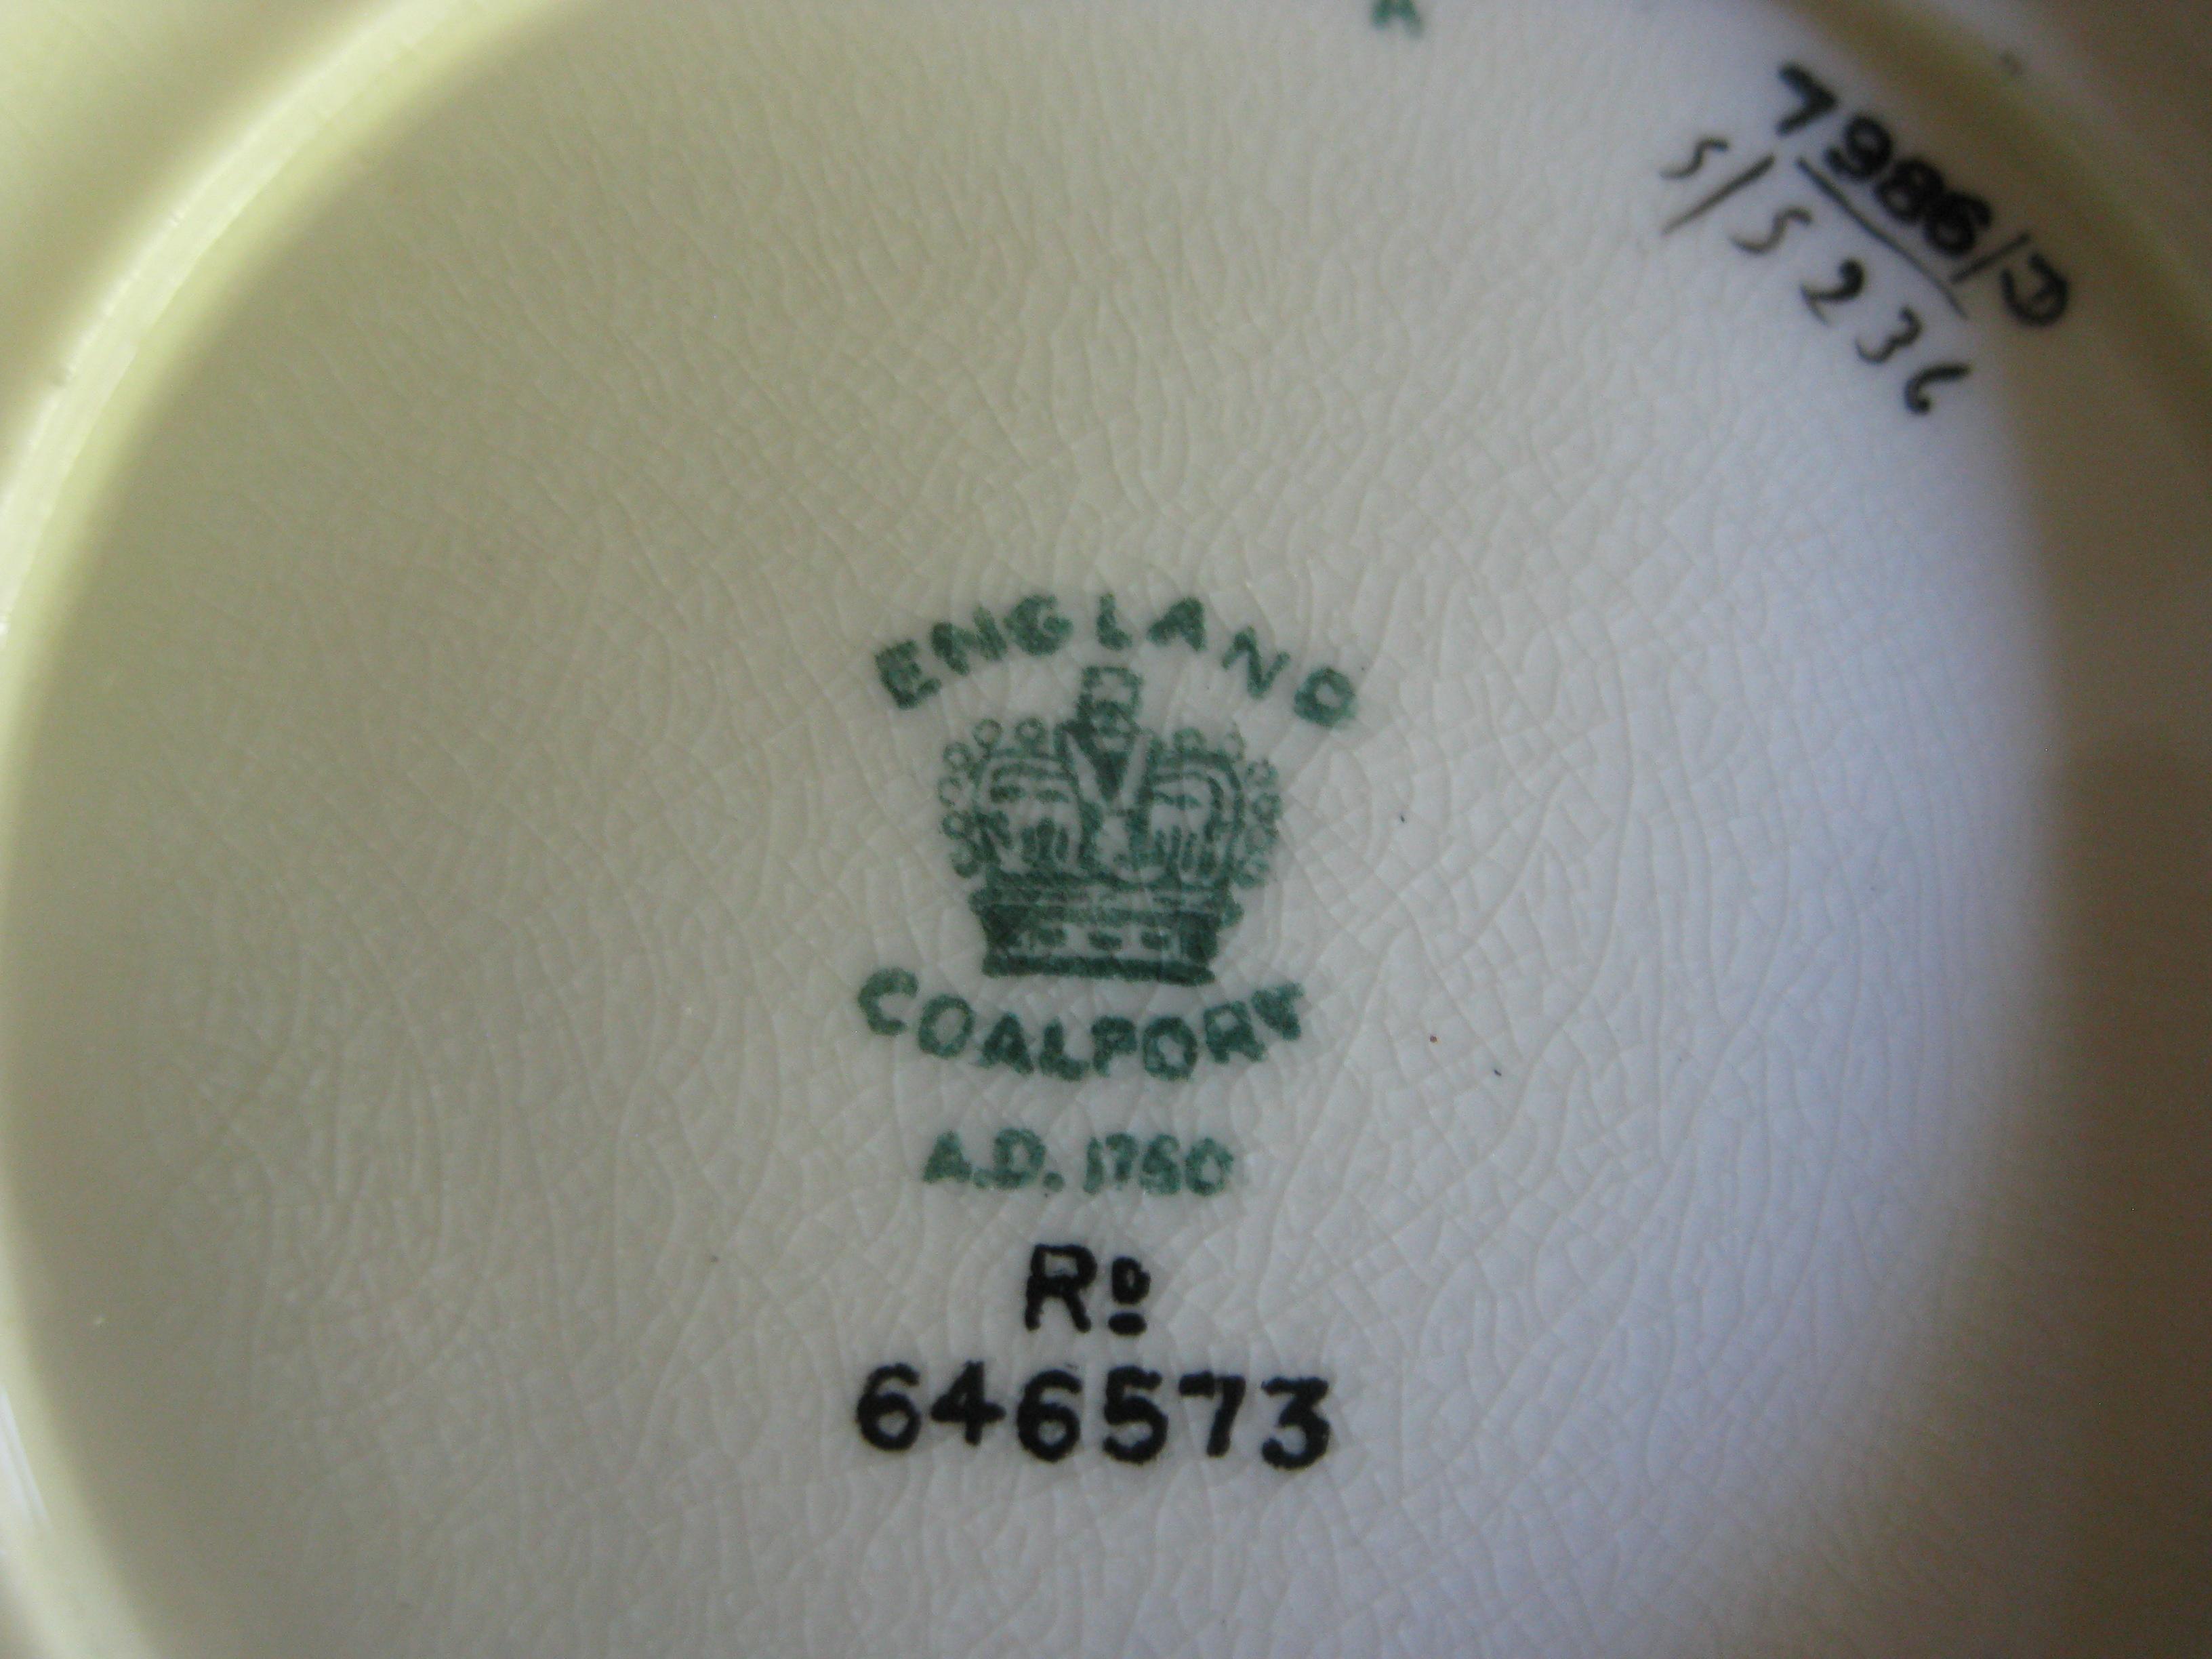 C11a. Coalport vase mark